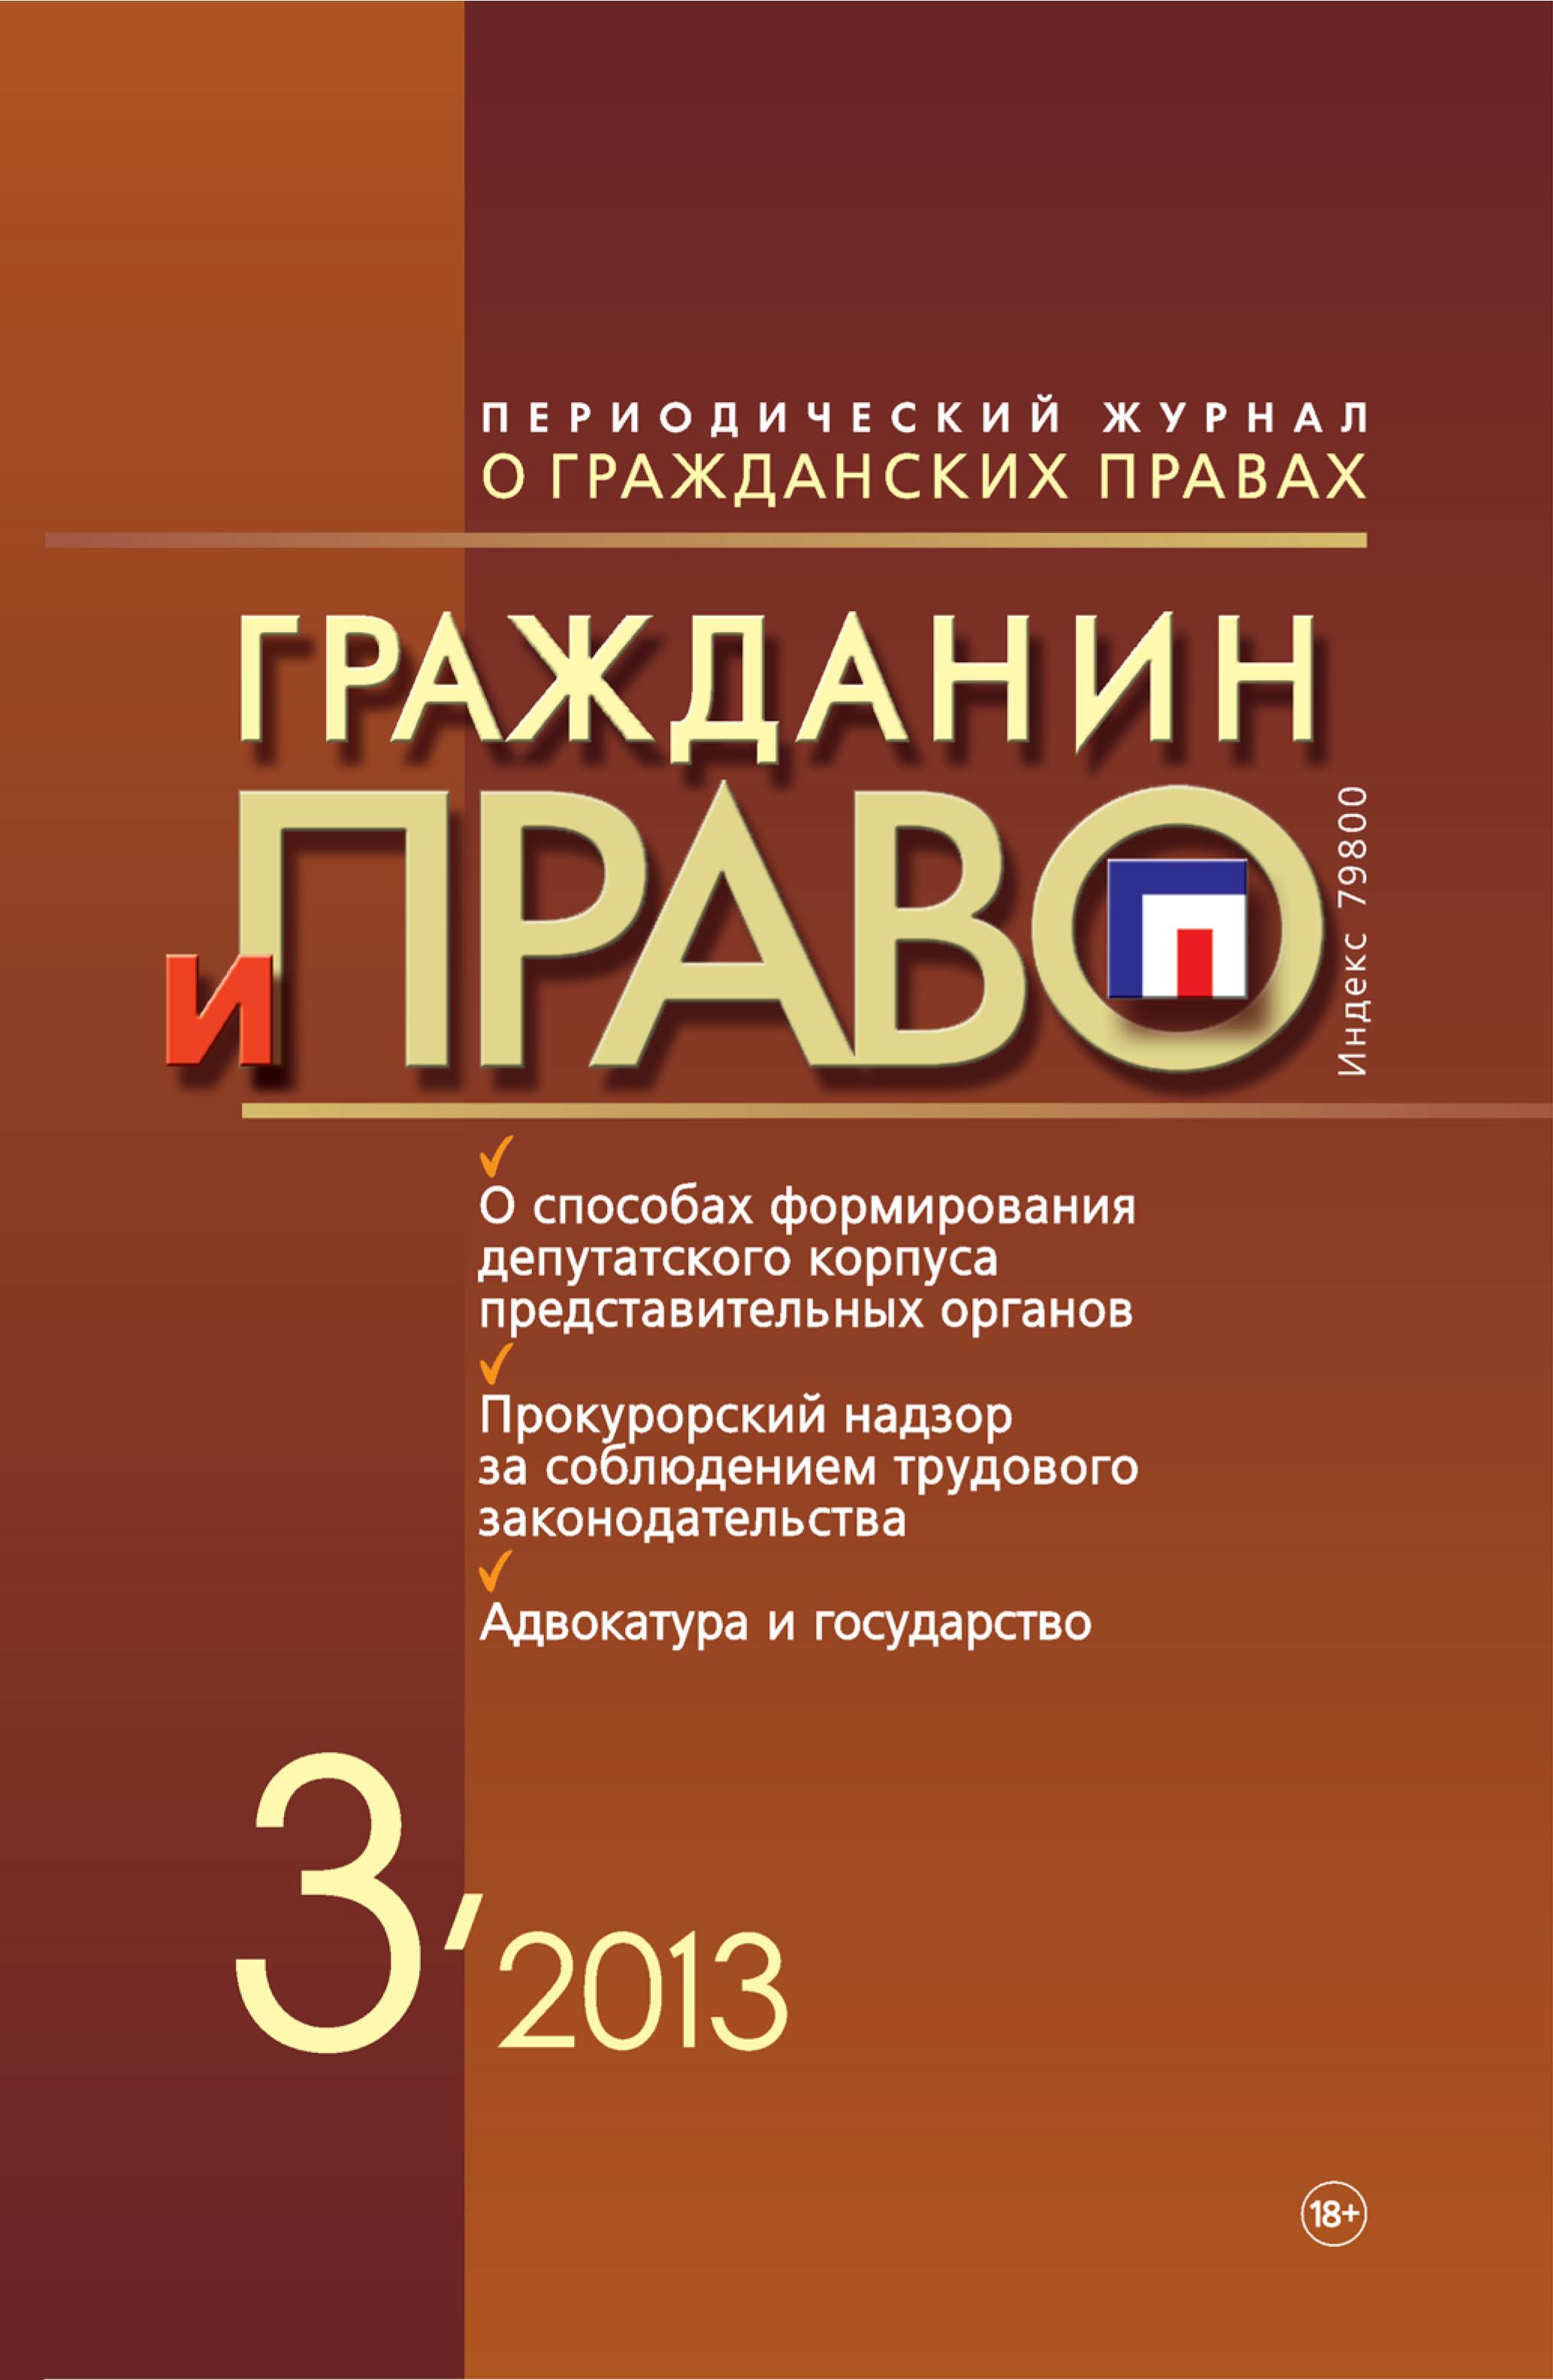 Гражданин и право №03/2013